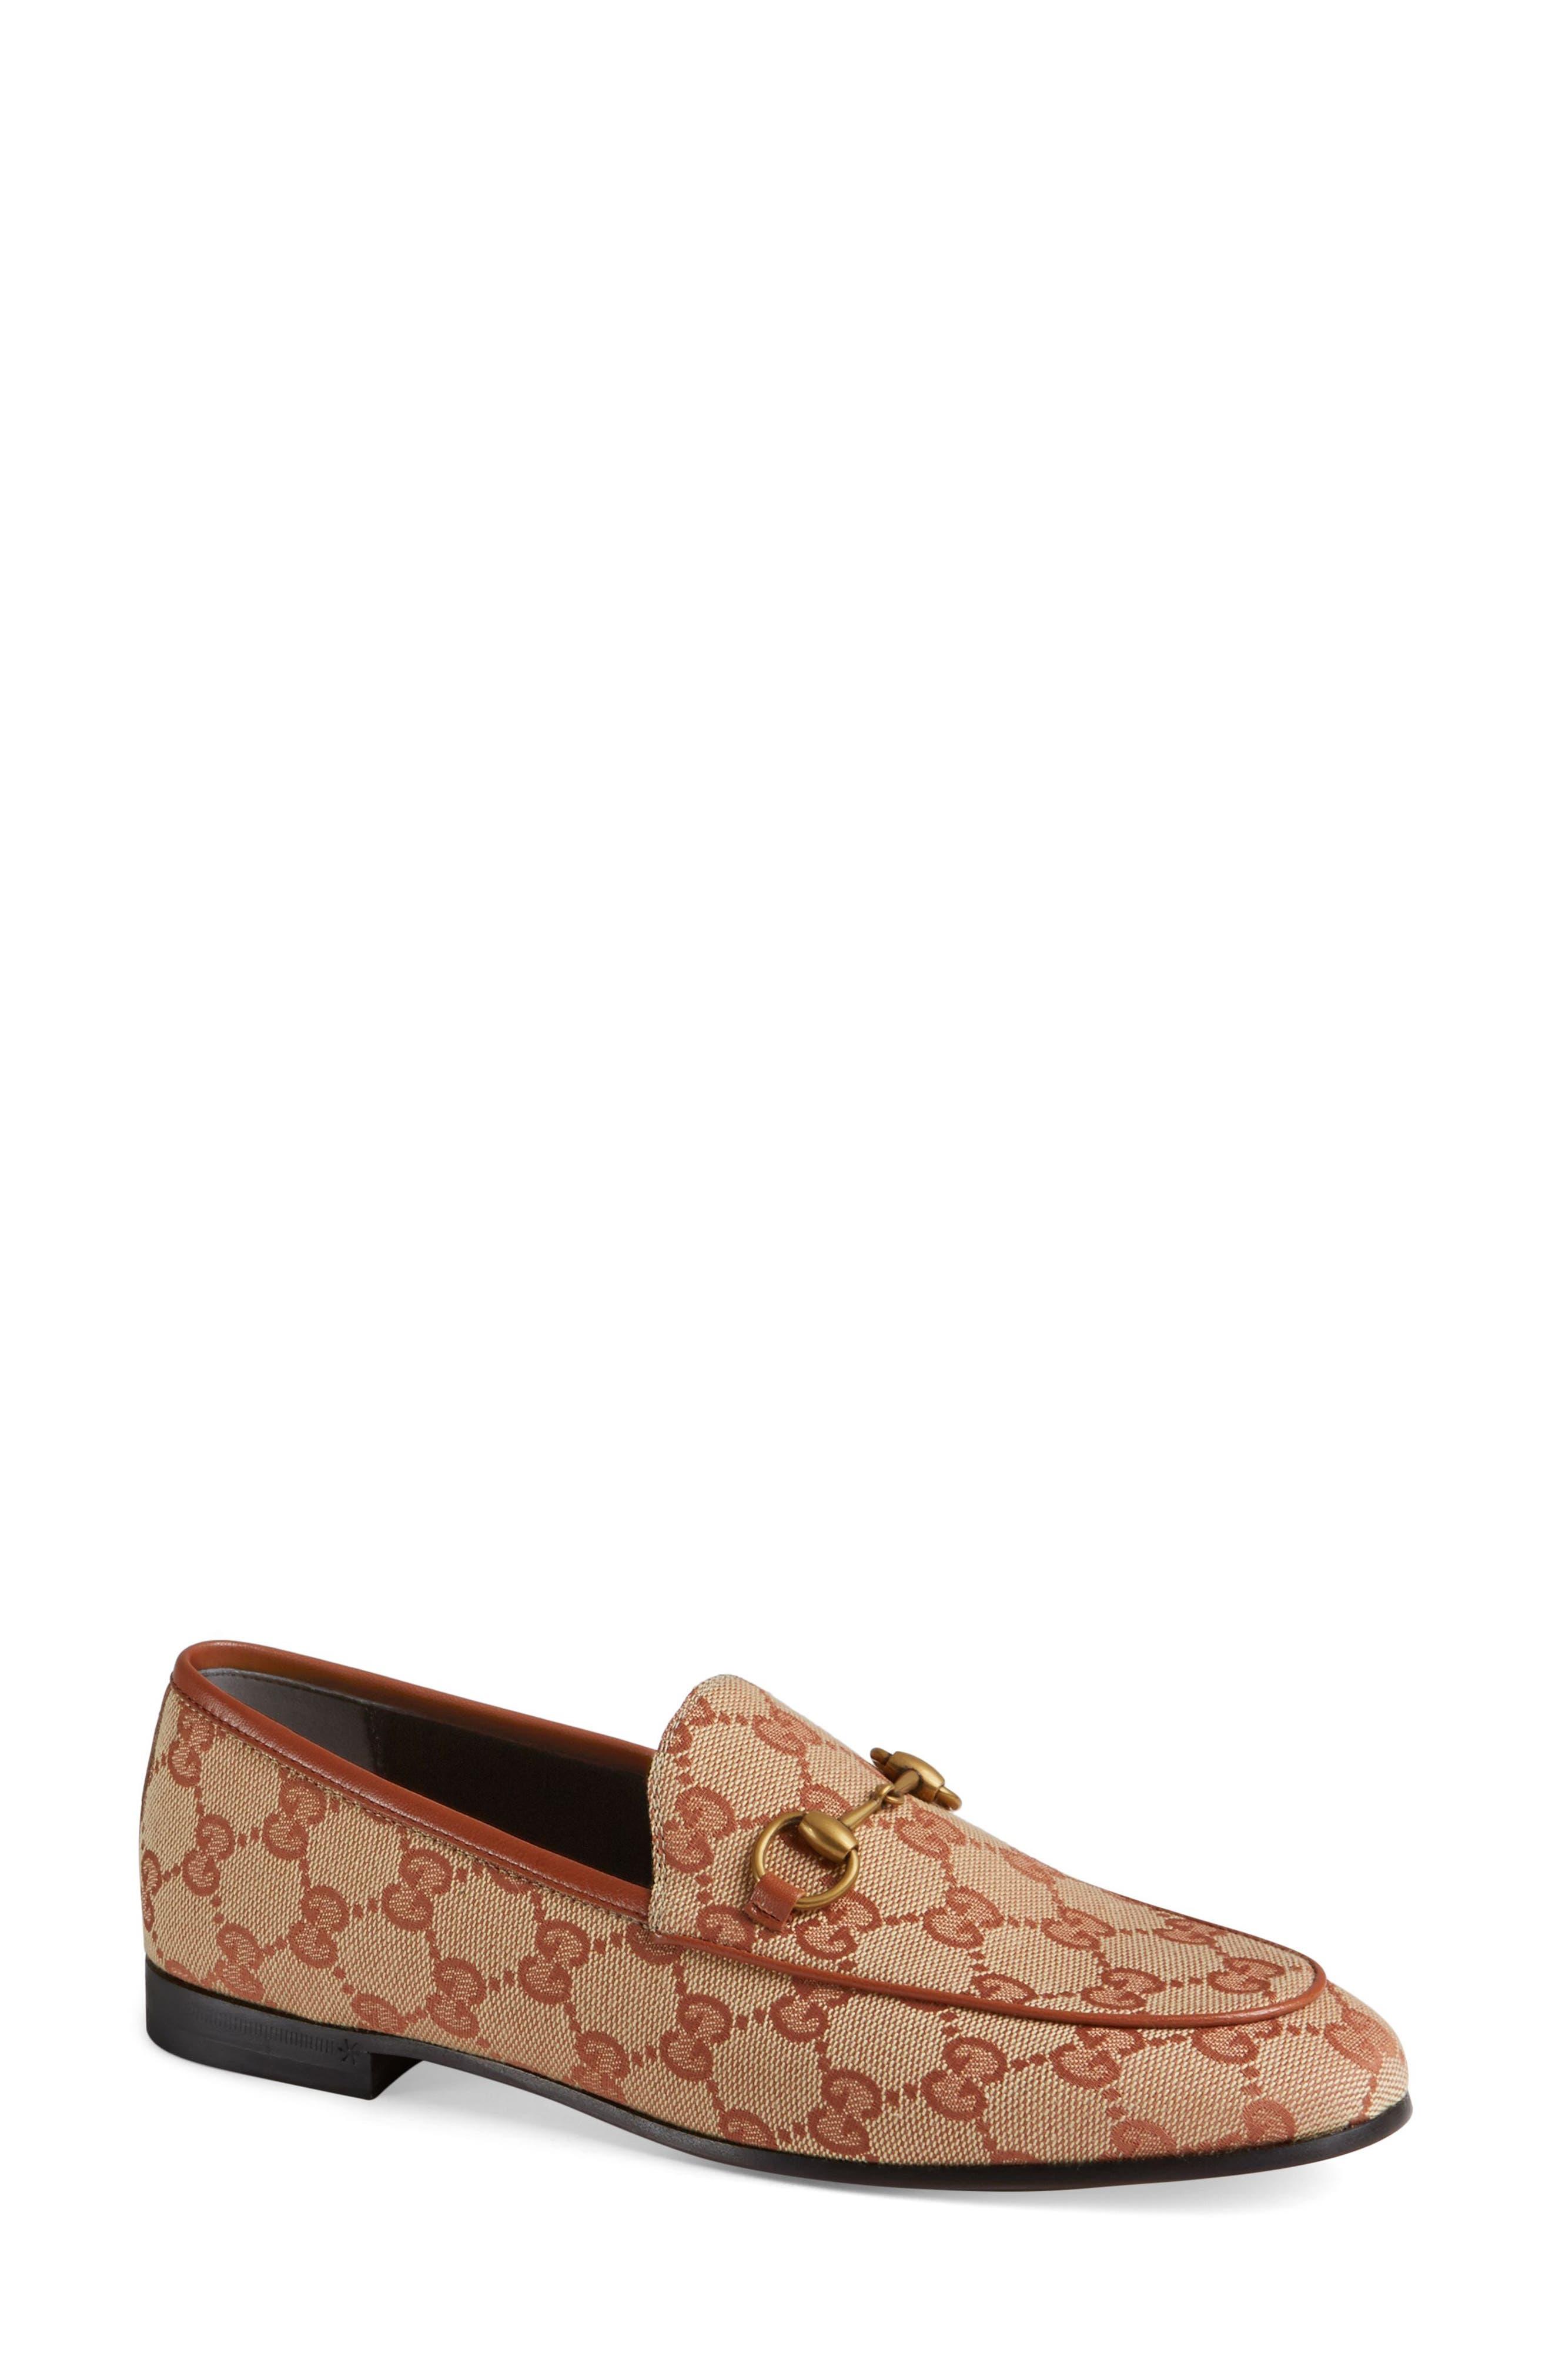 Gucci New Jordaan Loafer - Beige